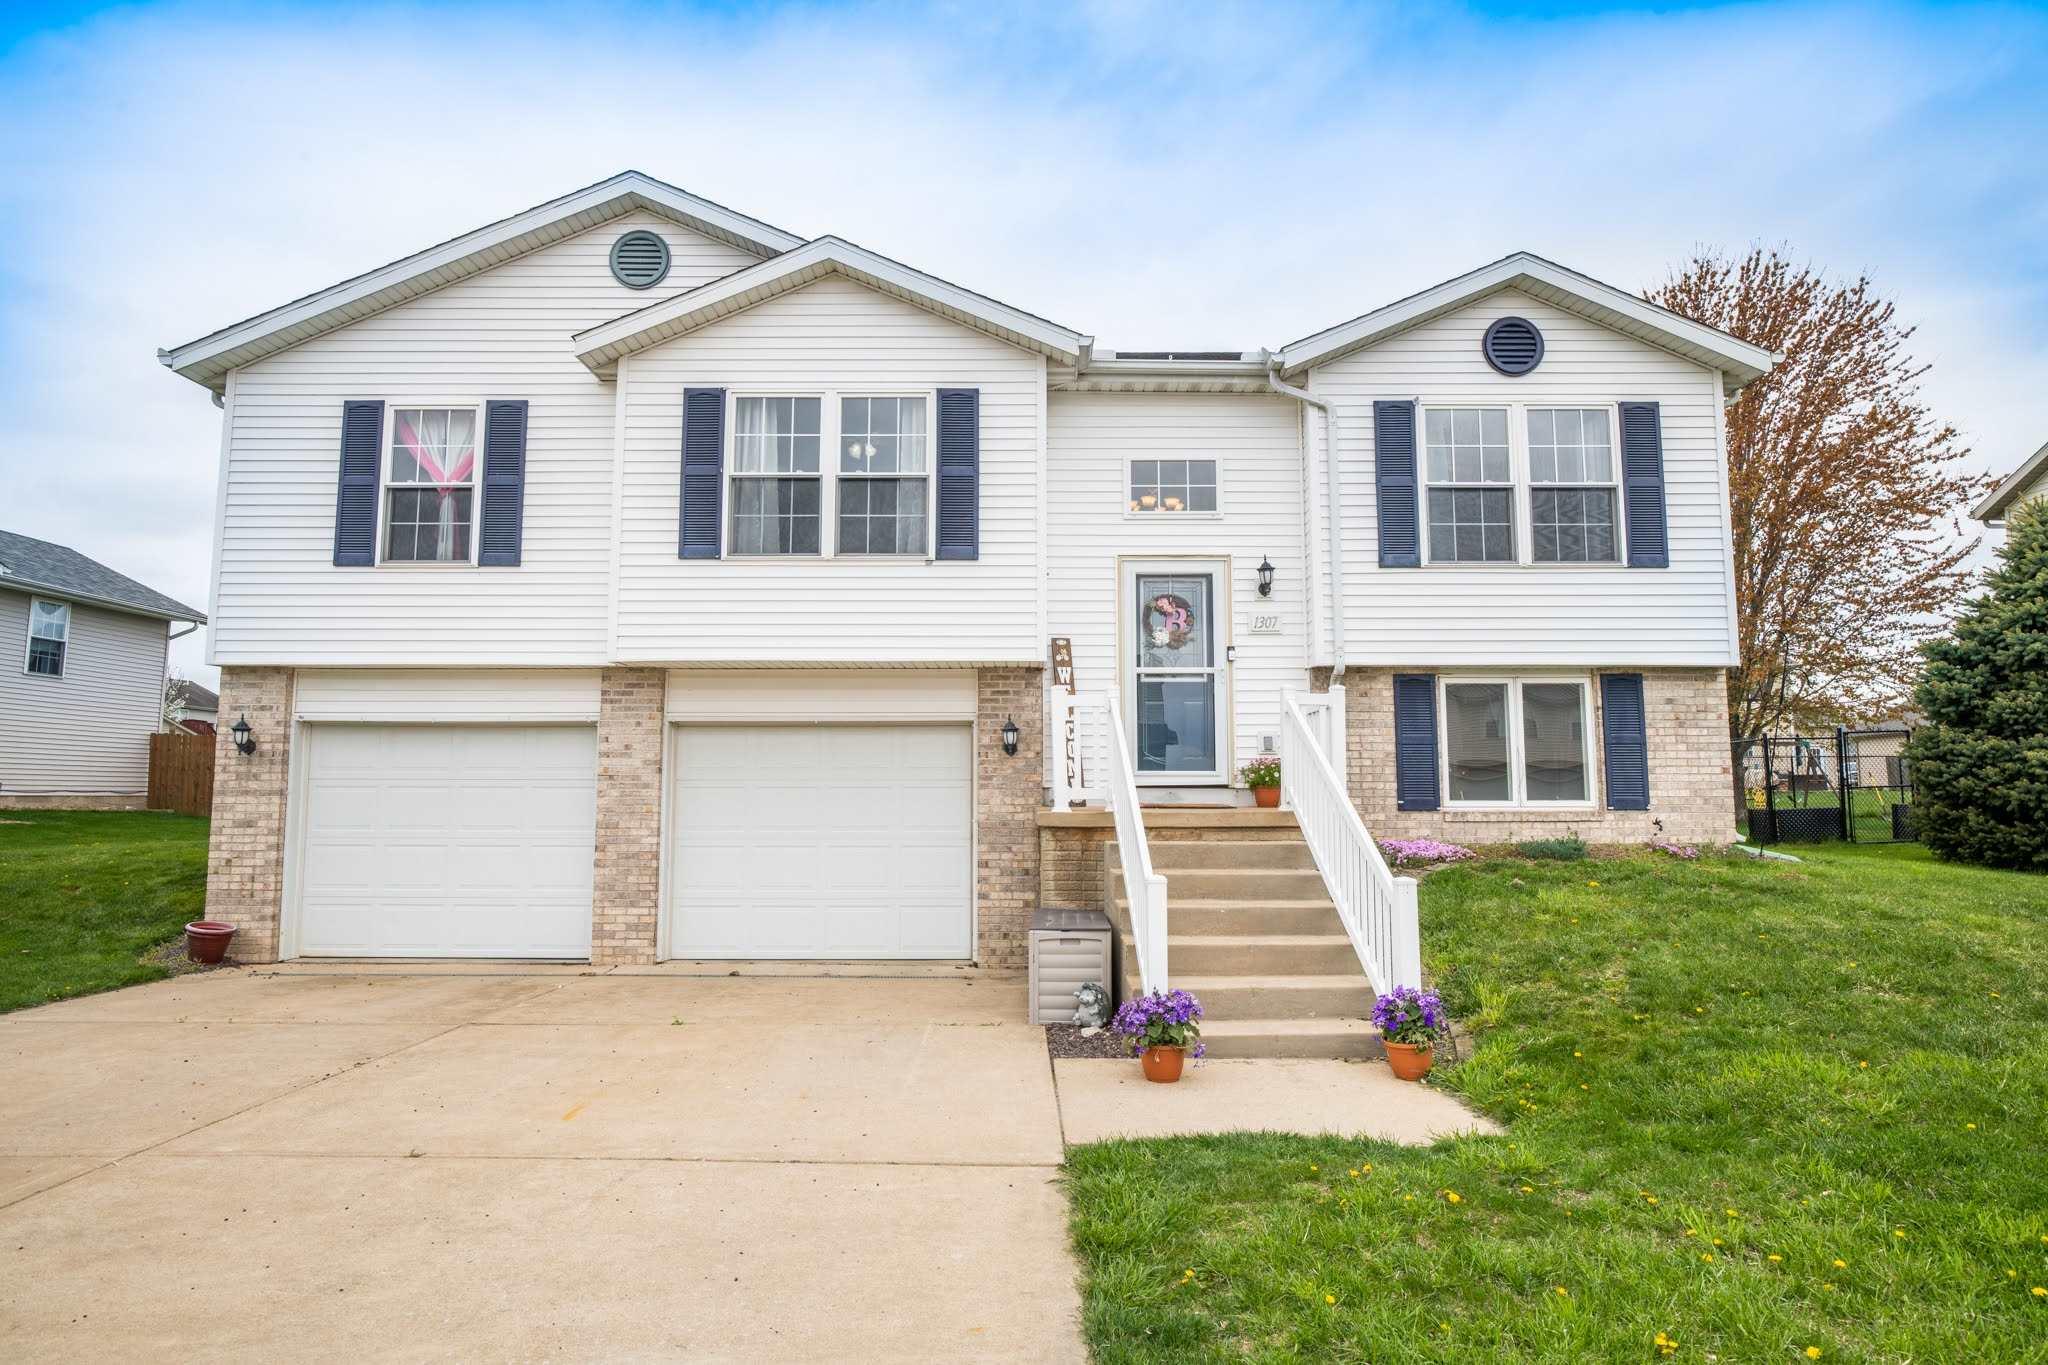 1307 WHITE HORSE Property Photo - Metamora, IL real estate listing